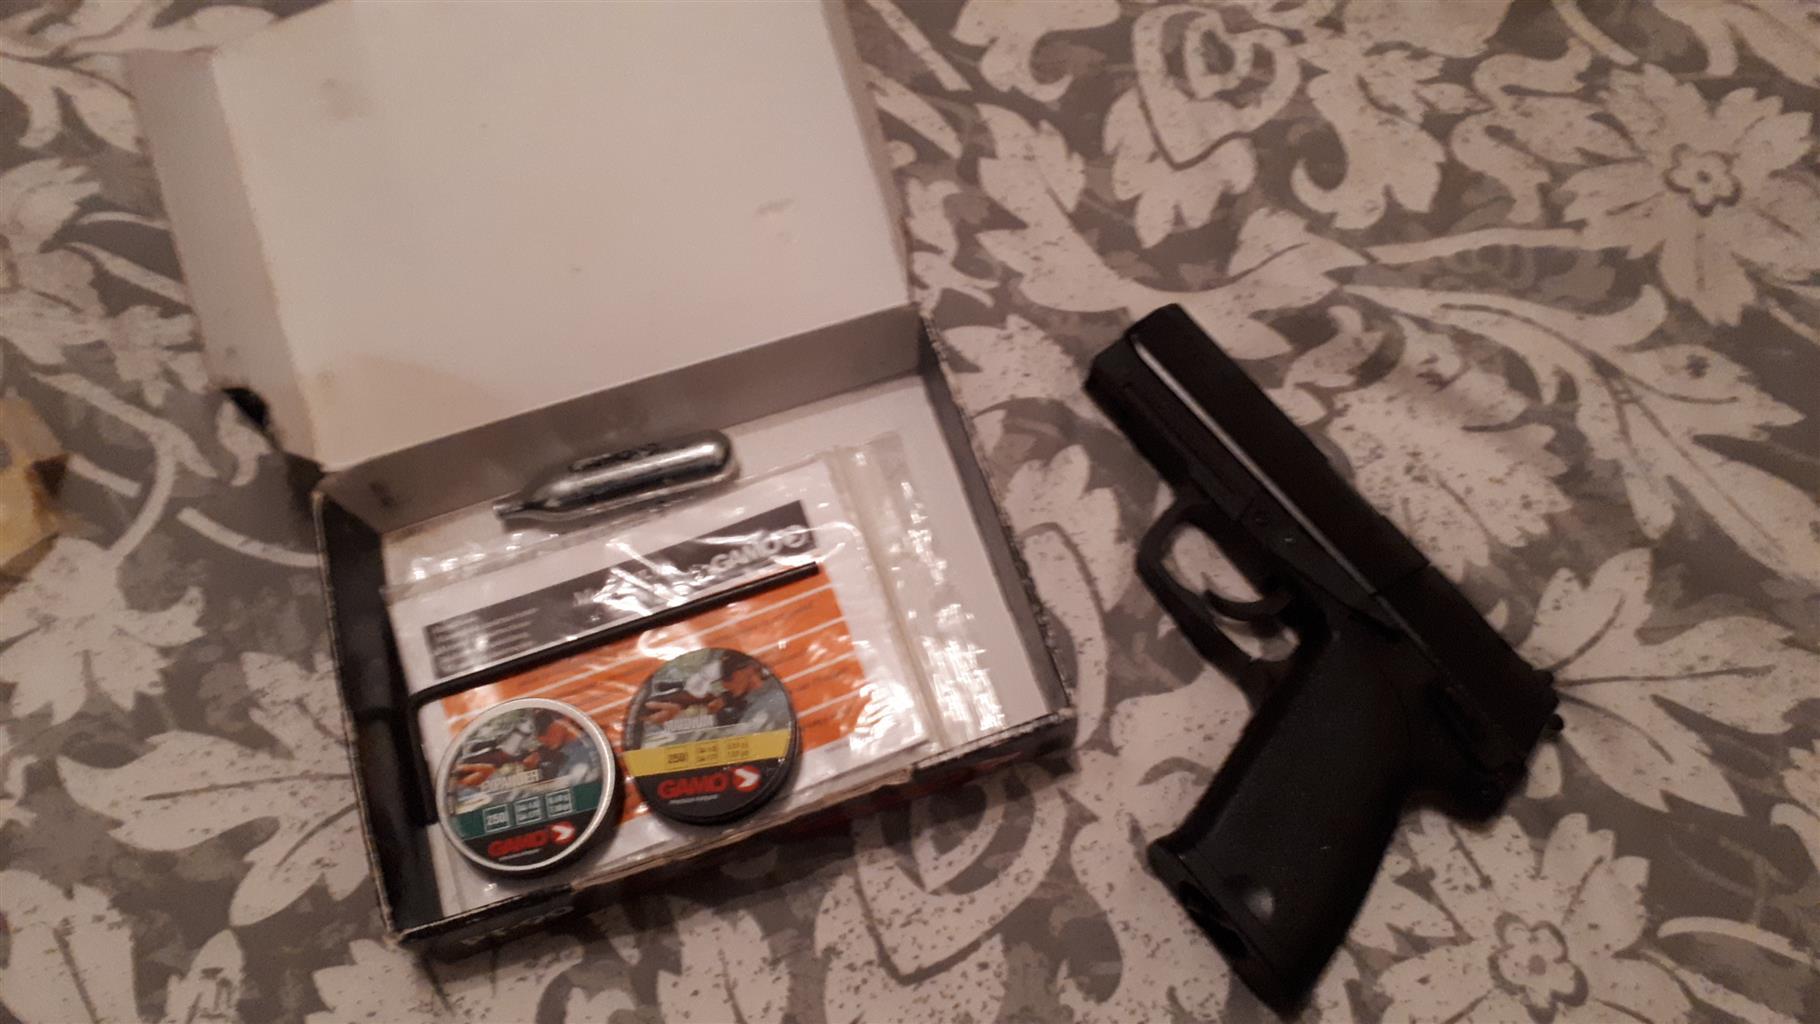 Gamo gas pistol